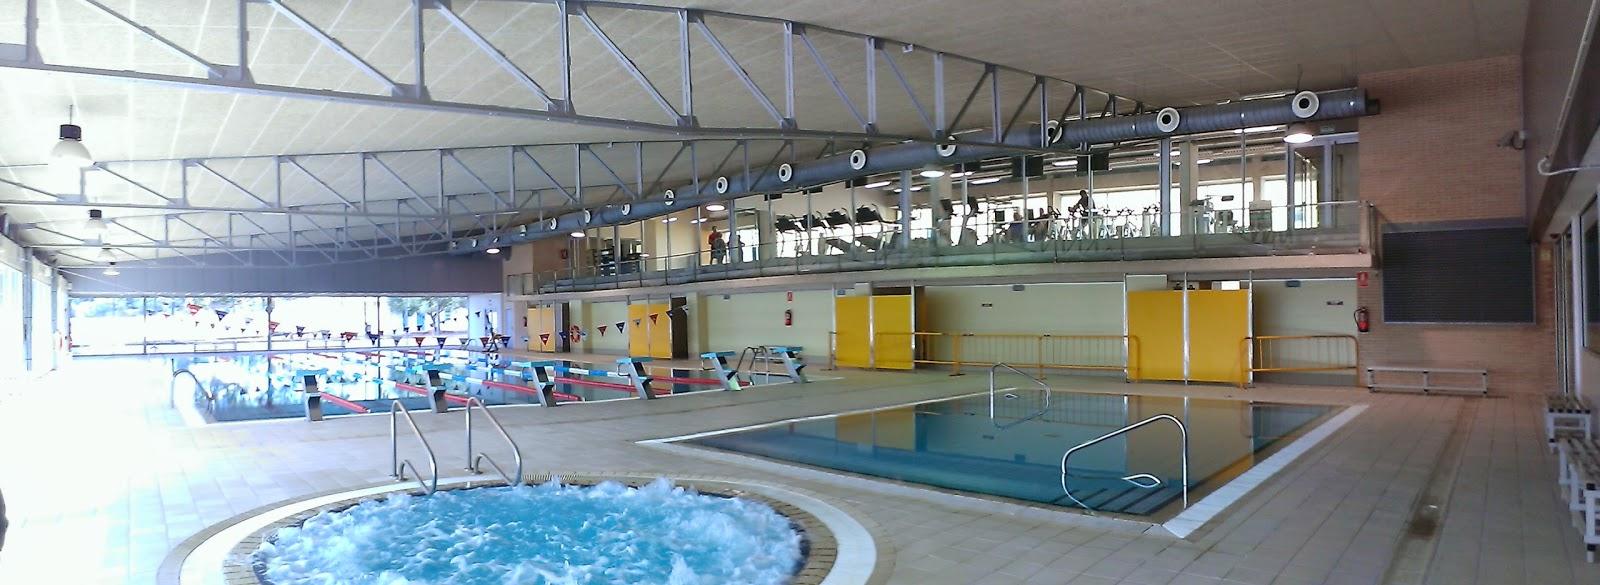 Blog gad arquitectura jornada de puertas abiertas piscina for Piscina benicassim